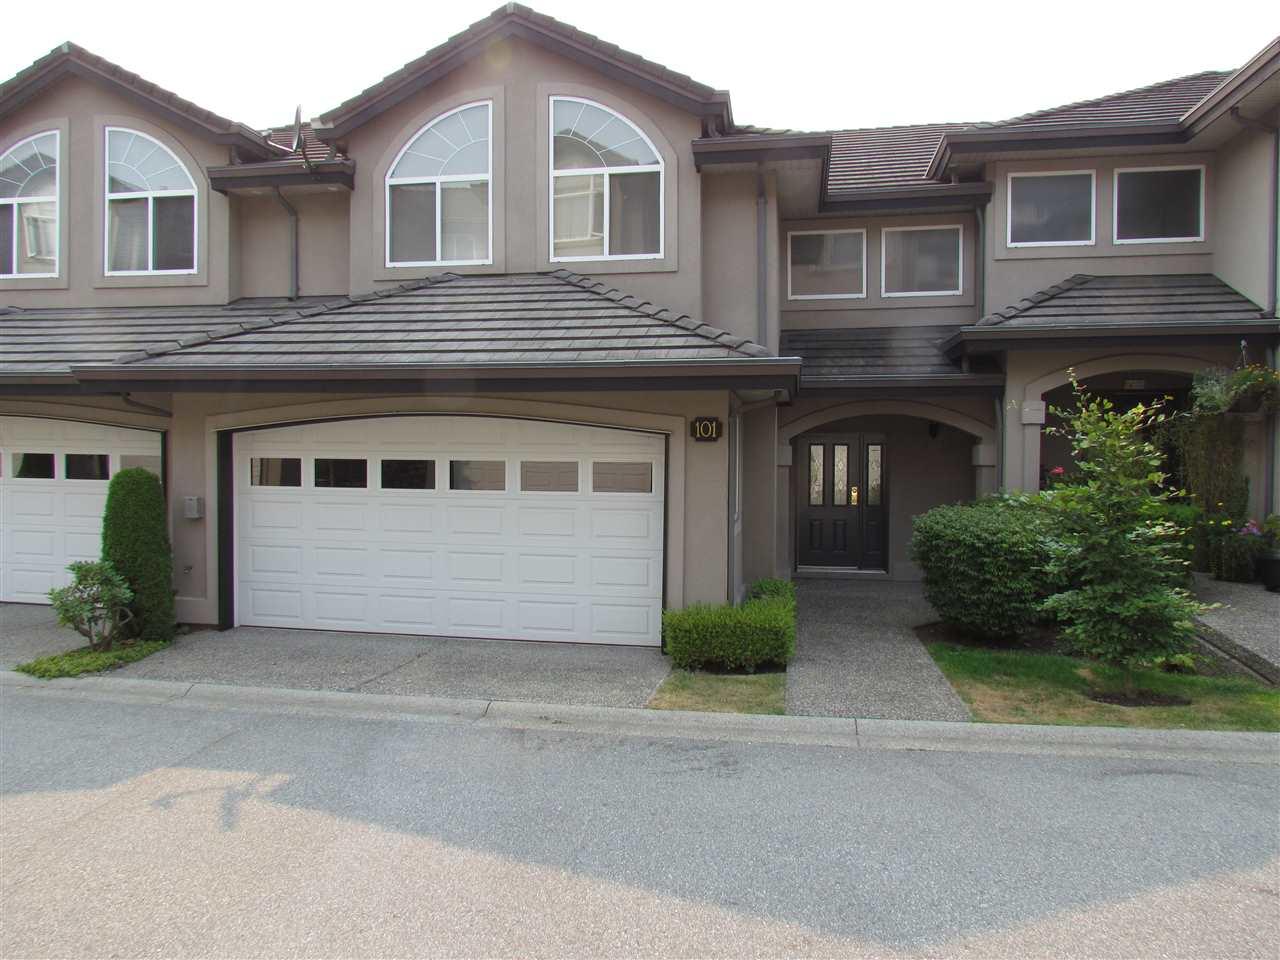 Townhouse at 101 678 CITADEL DRIVE, Unit 101, Port Coquitlam, British Columbia. Image 2